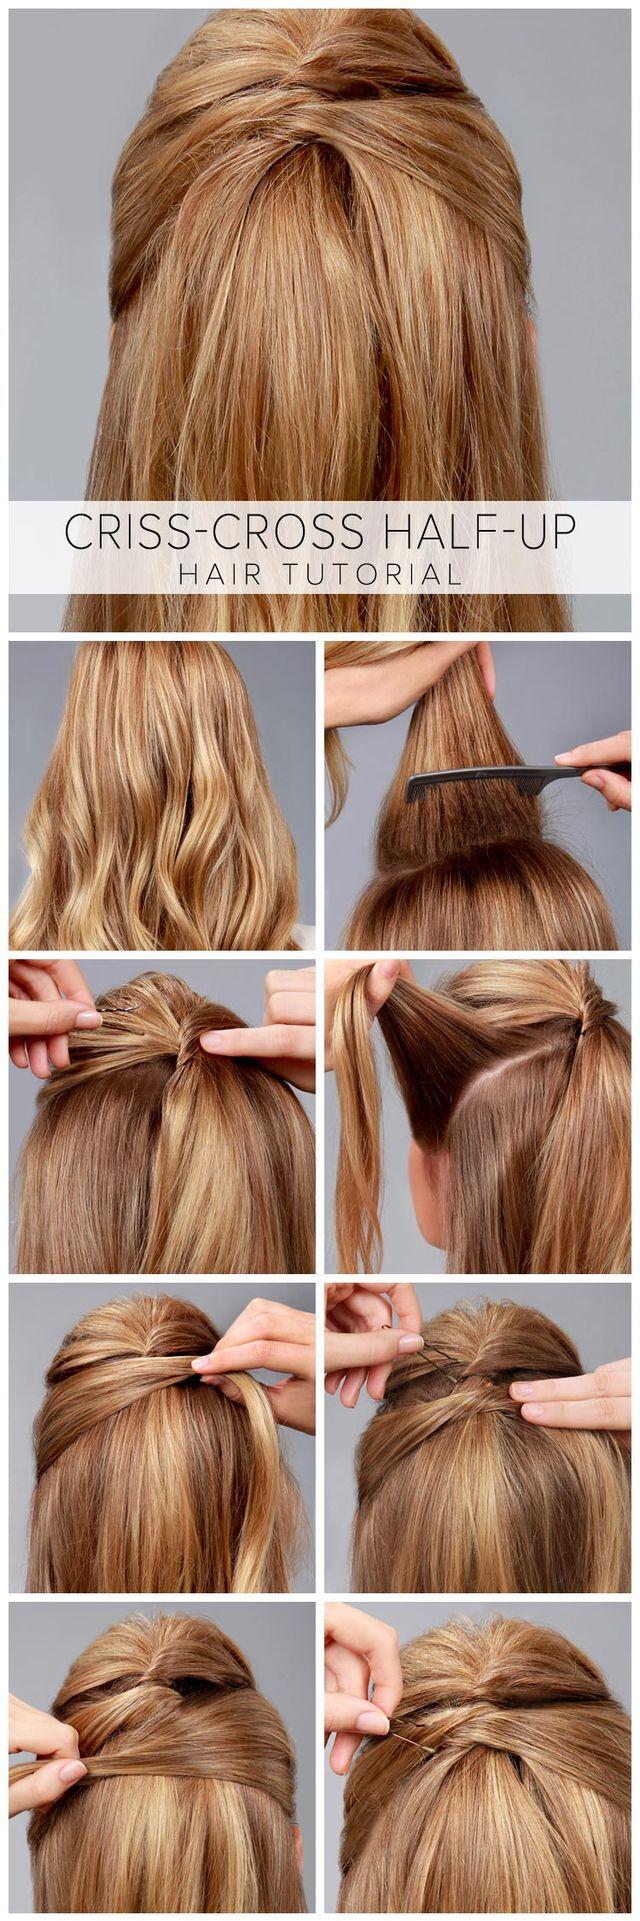 Lulus howto crisscross halfup hair tutorial tutorials hair